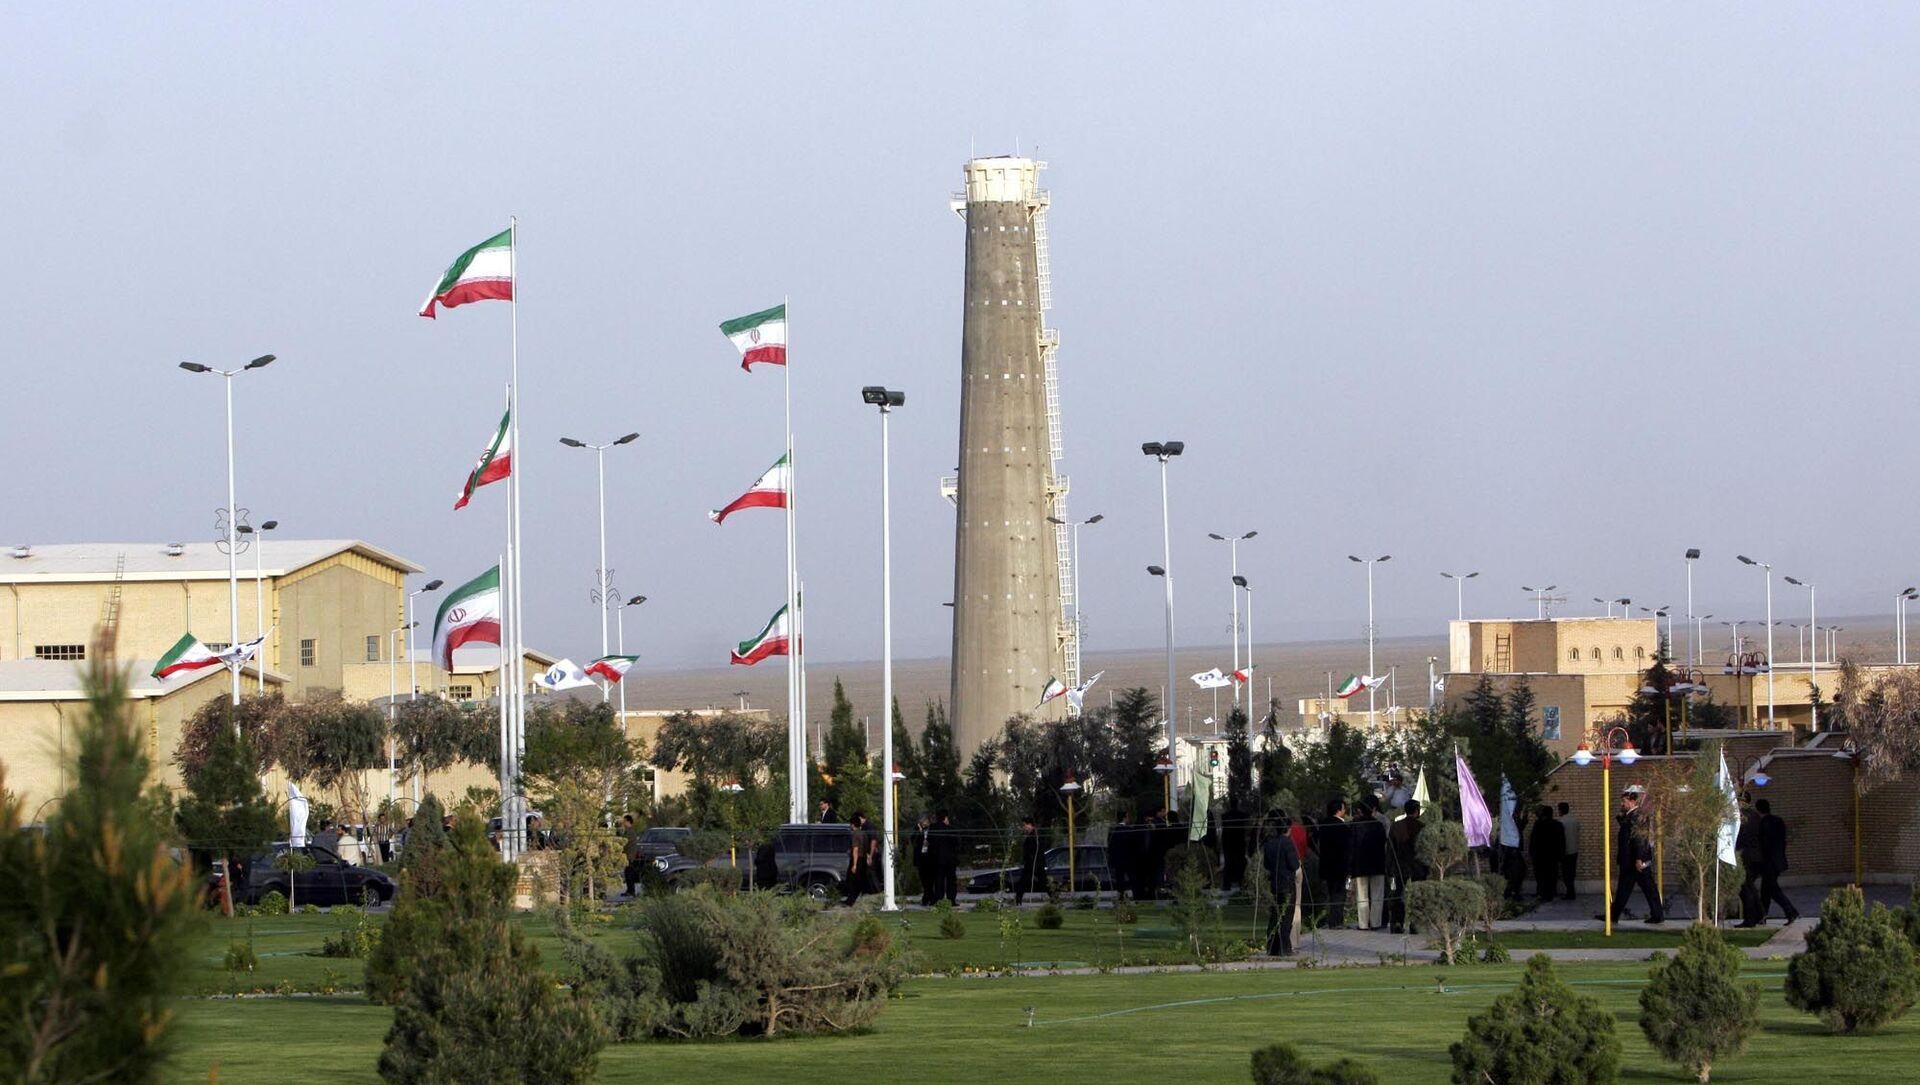 Iran's nuclear enrichment facility in Natanz in 300 kms 186 (miles) south of capital Tehran, Iran (File) - Sputnik International, 1920, 08.02.2021